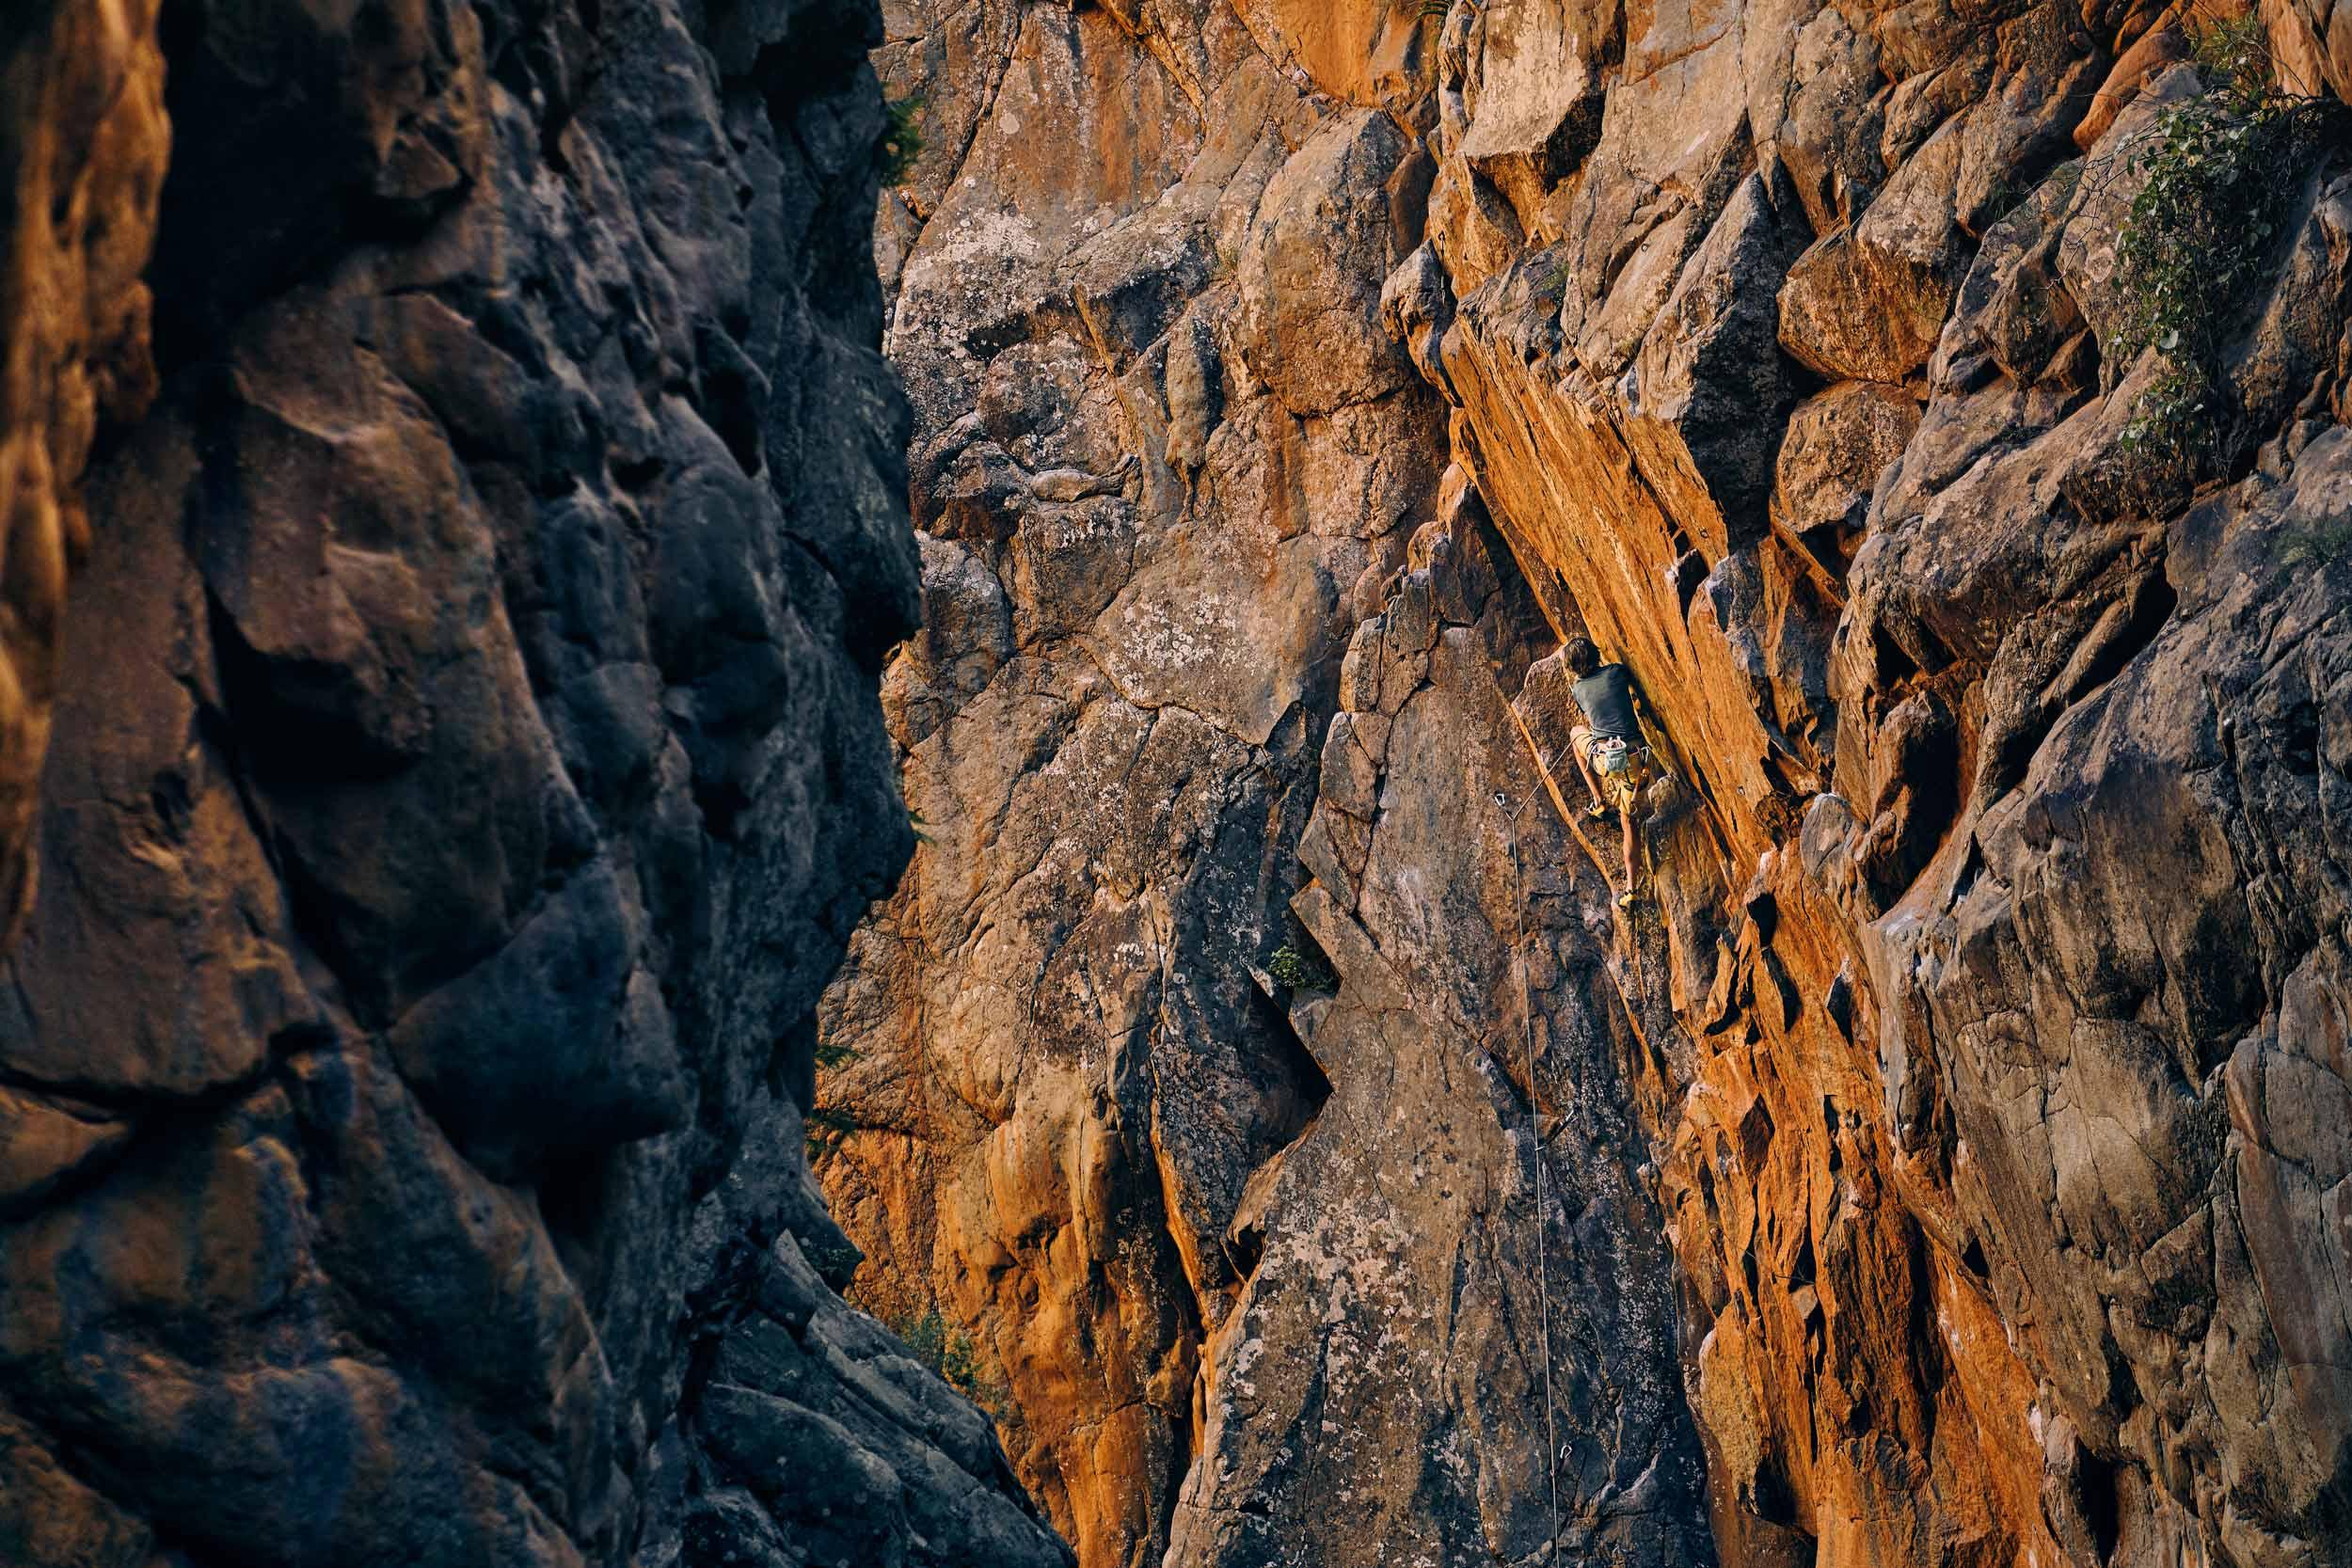 121918_maguire_eb_tenerife_climbing_3297